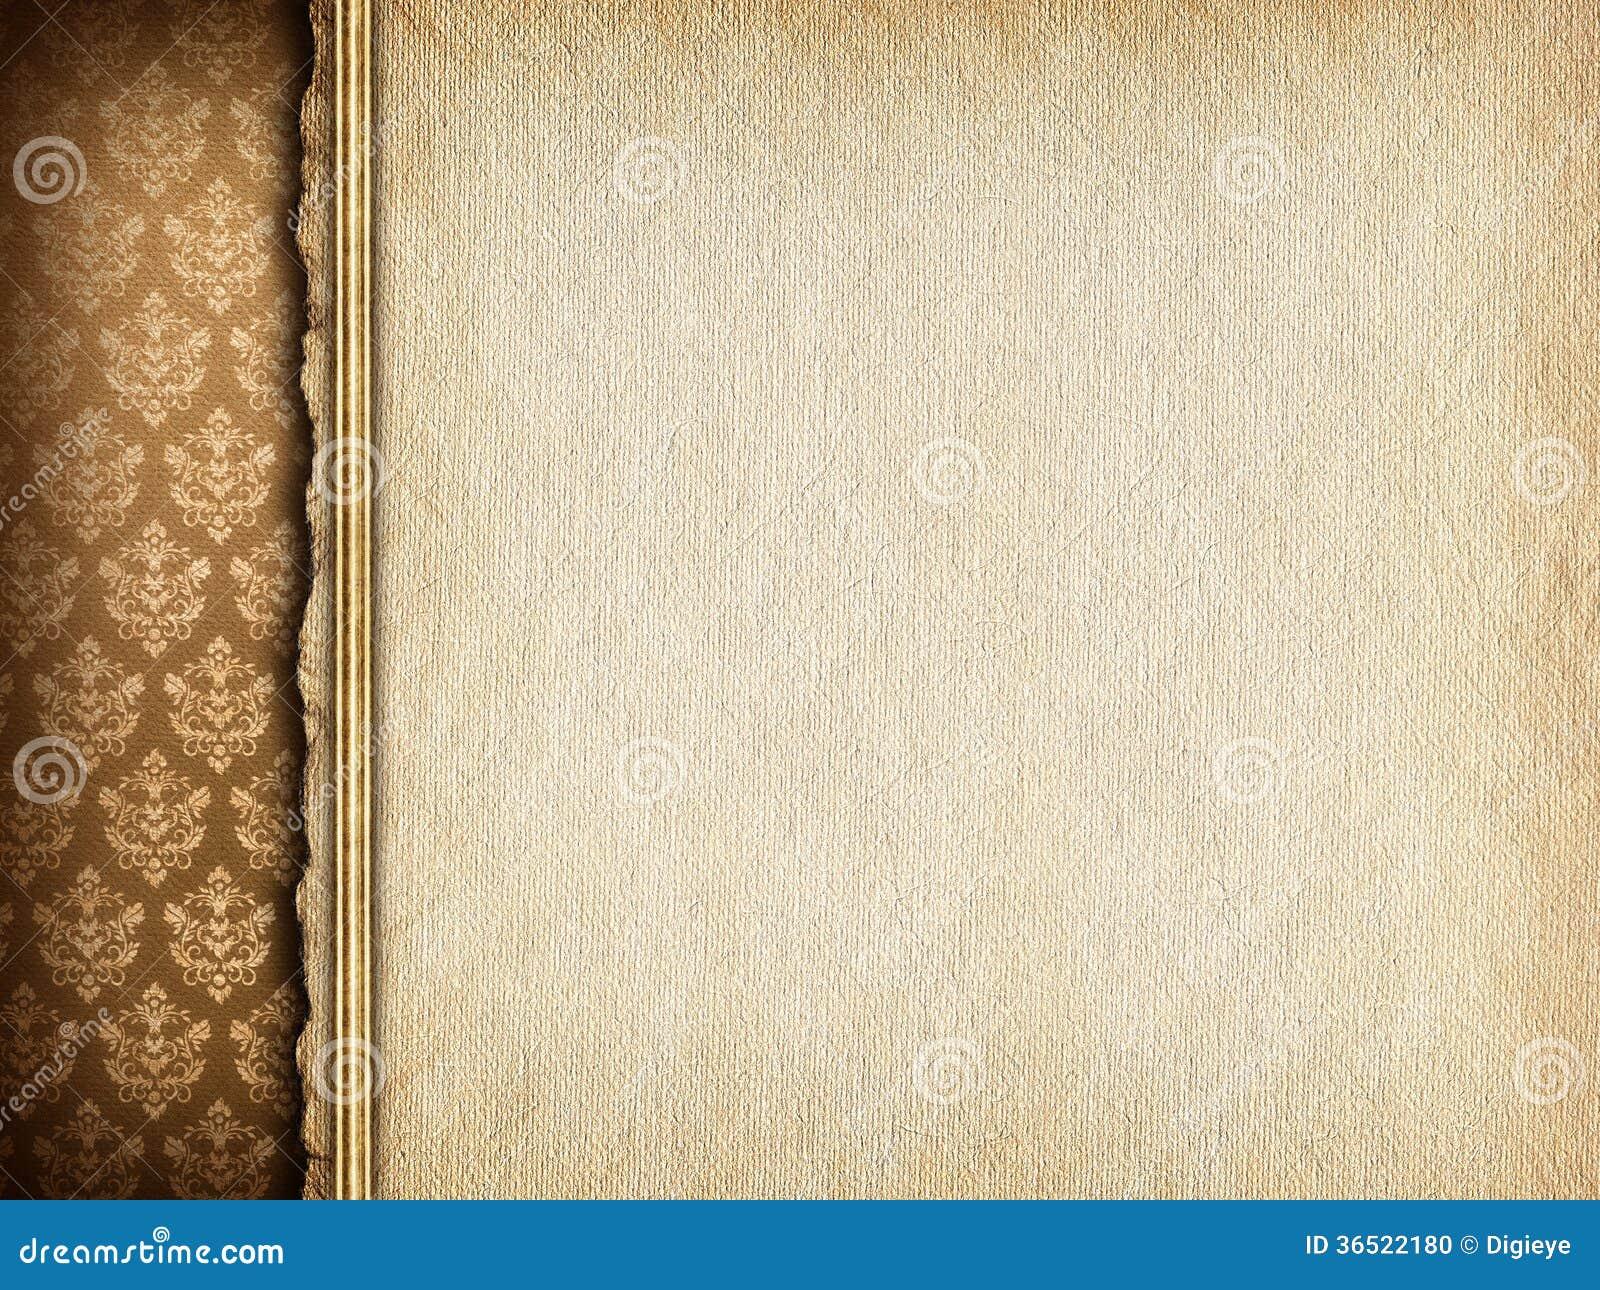 Handmade paper sheet on wallpaper background stock for Wallpaper sheets